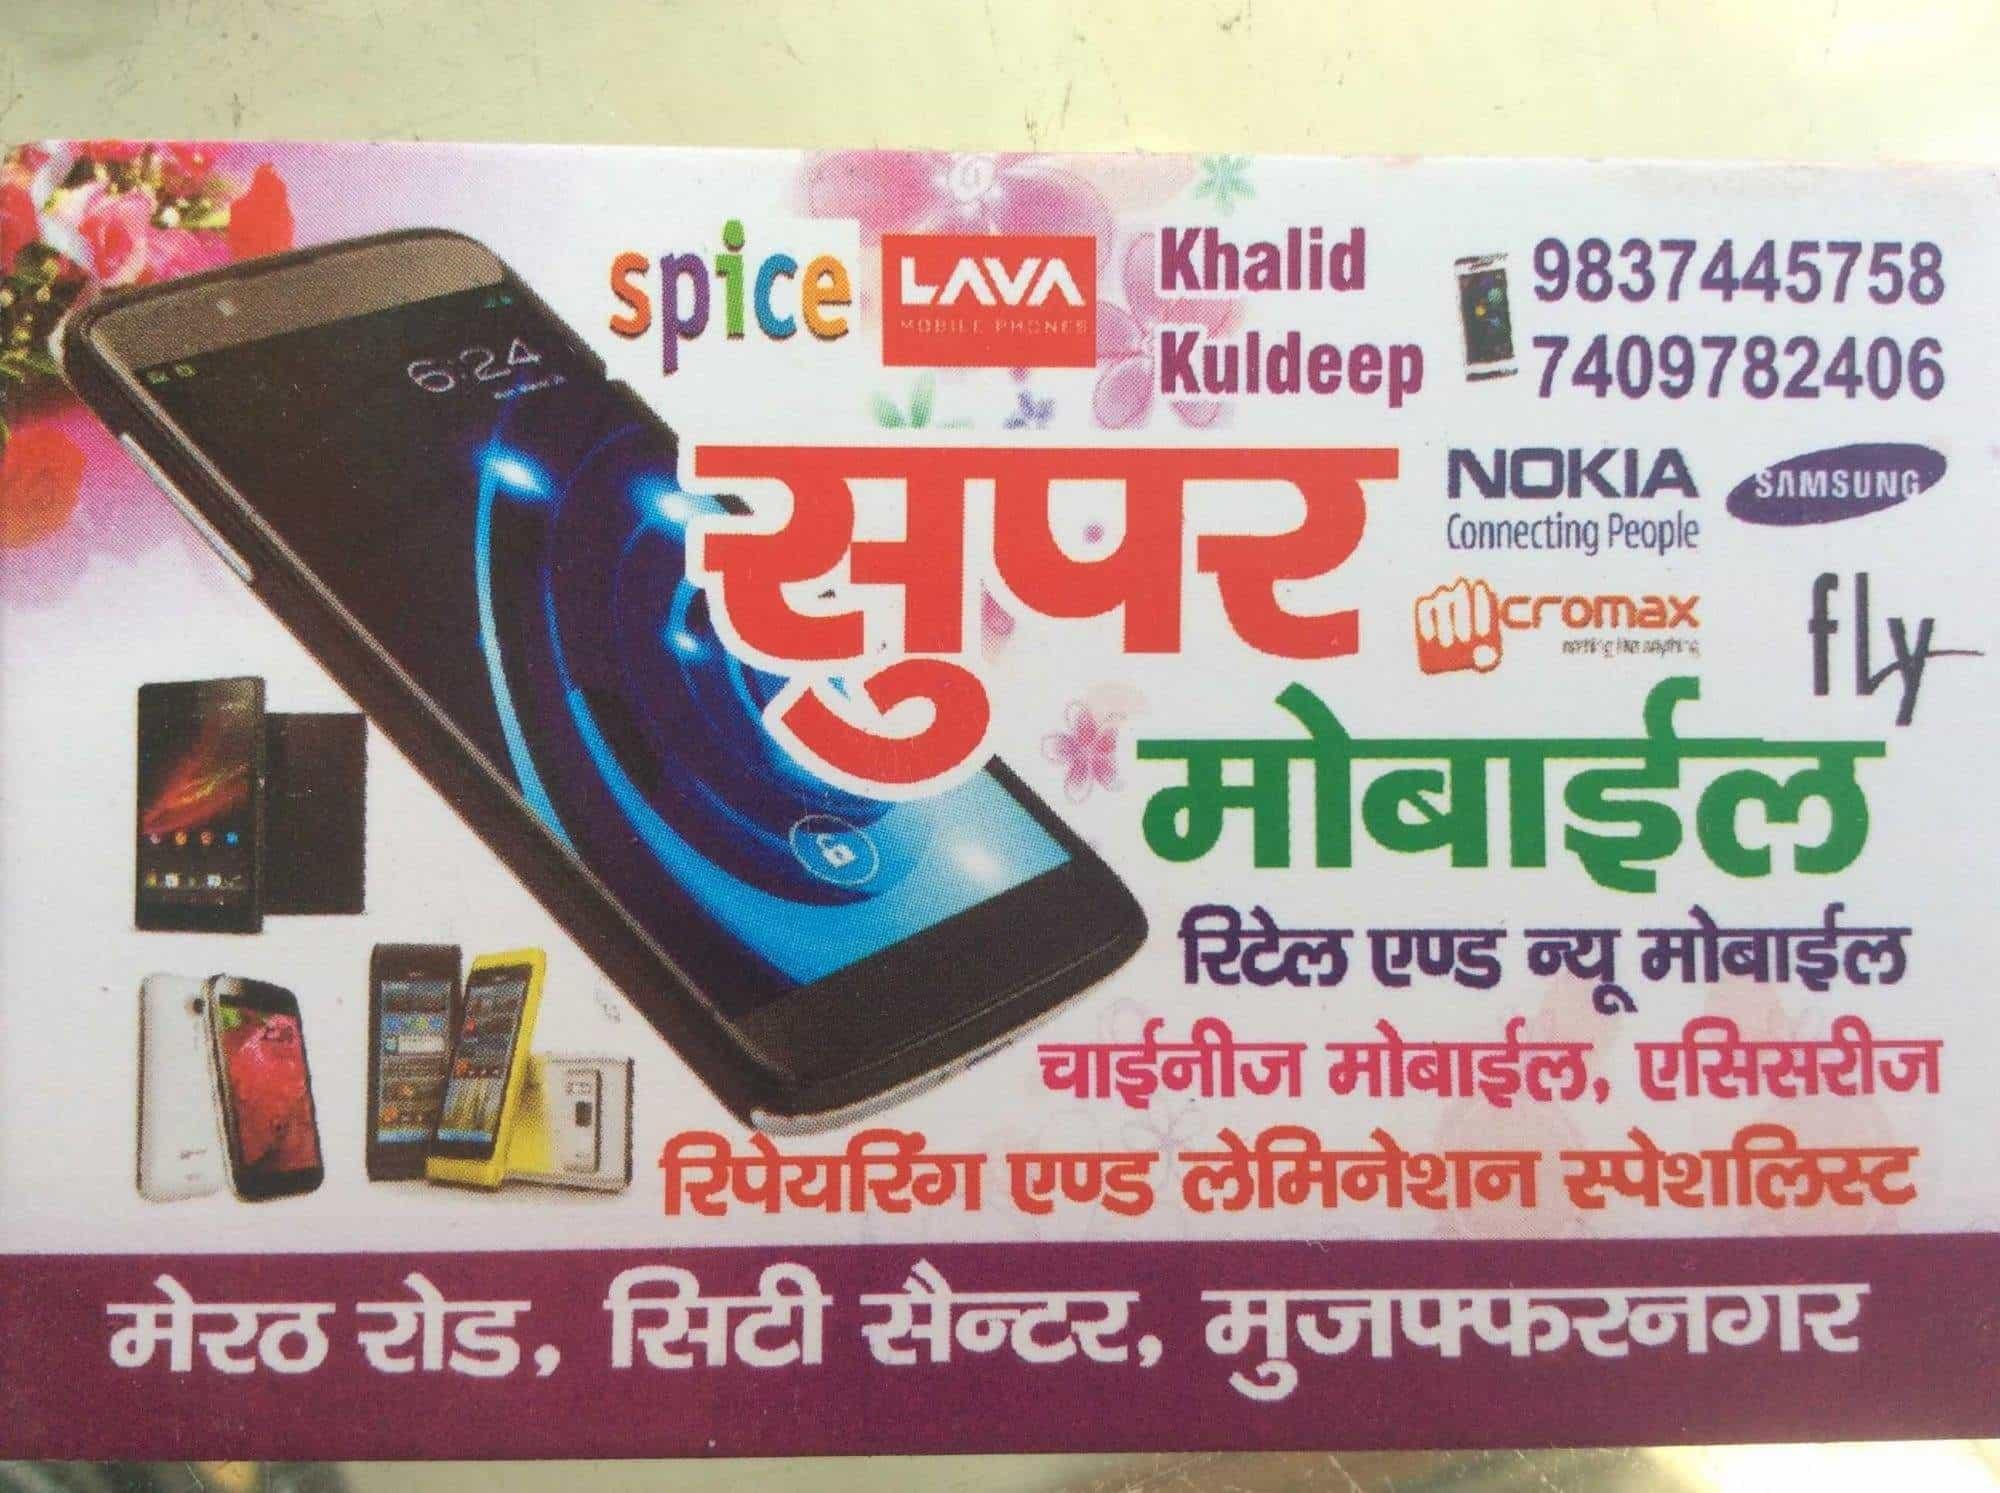 Super Mobile, Muzaffar Nagar City - Mobile Phone Dealers in